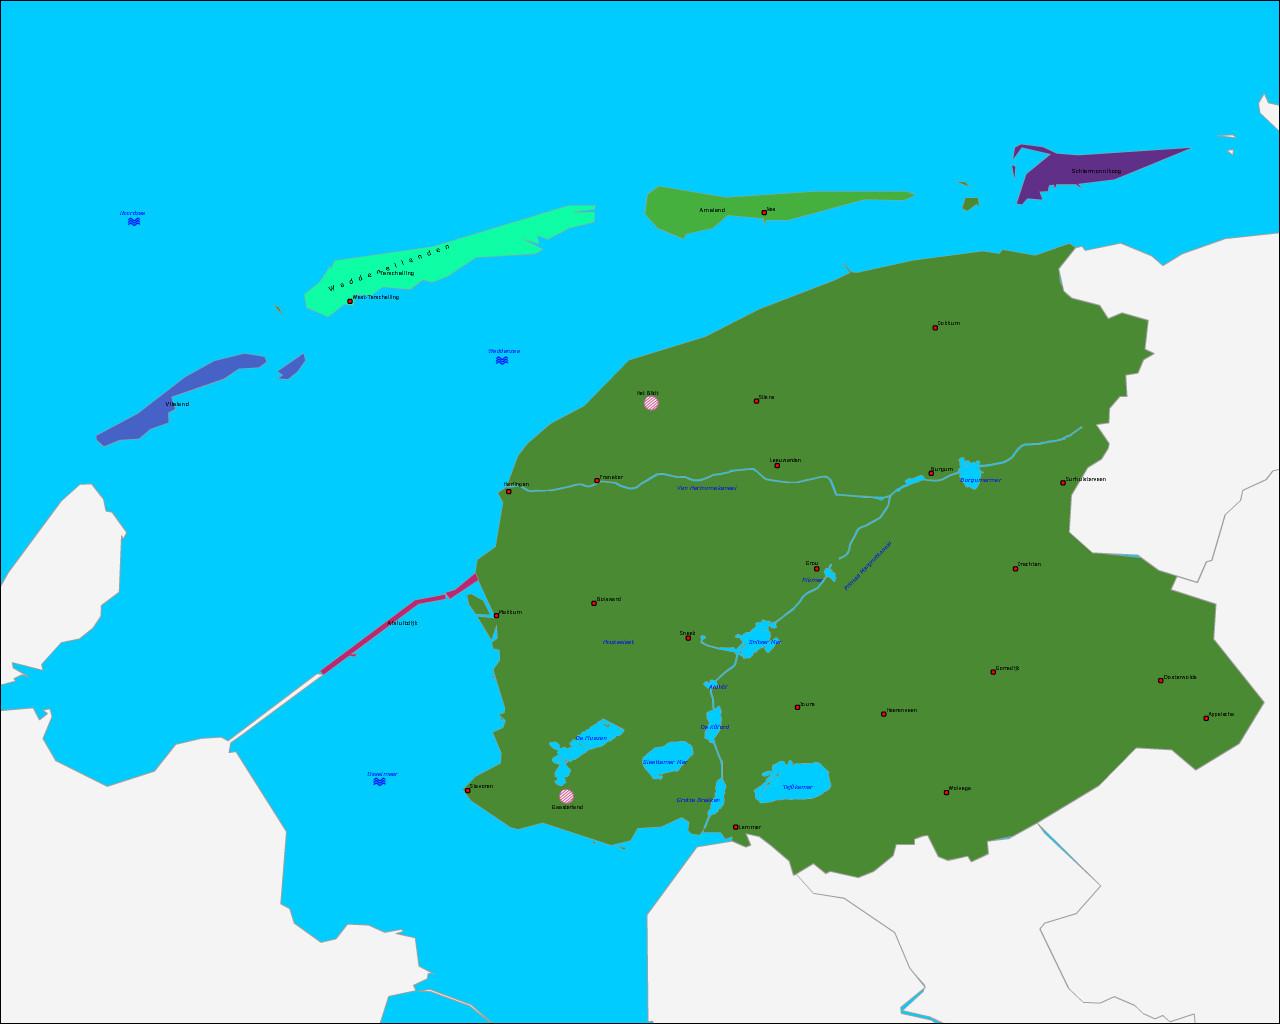 provincie-fryslan-friesland